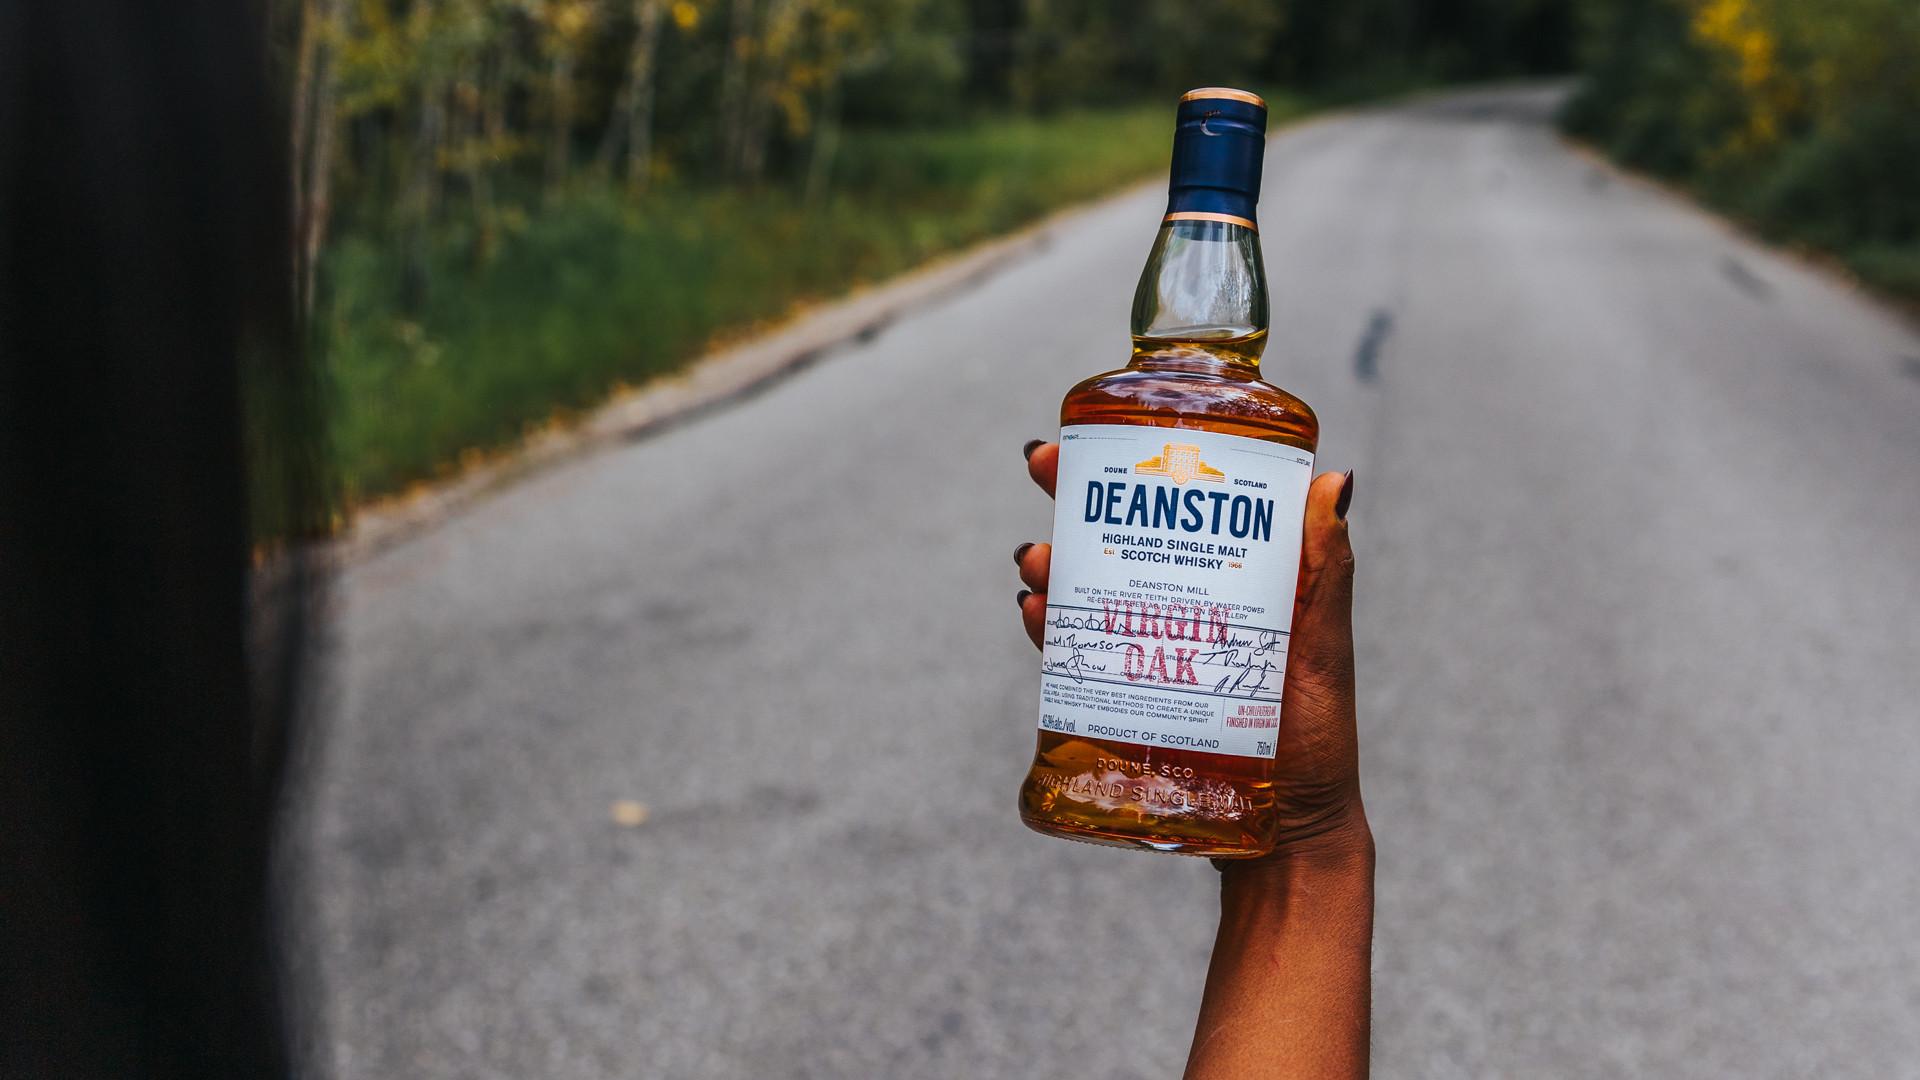 Deanston smoked old fashioned recipe | a bottle of Deanston Virgin Oak